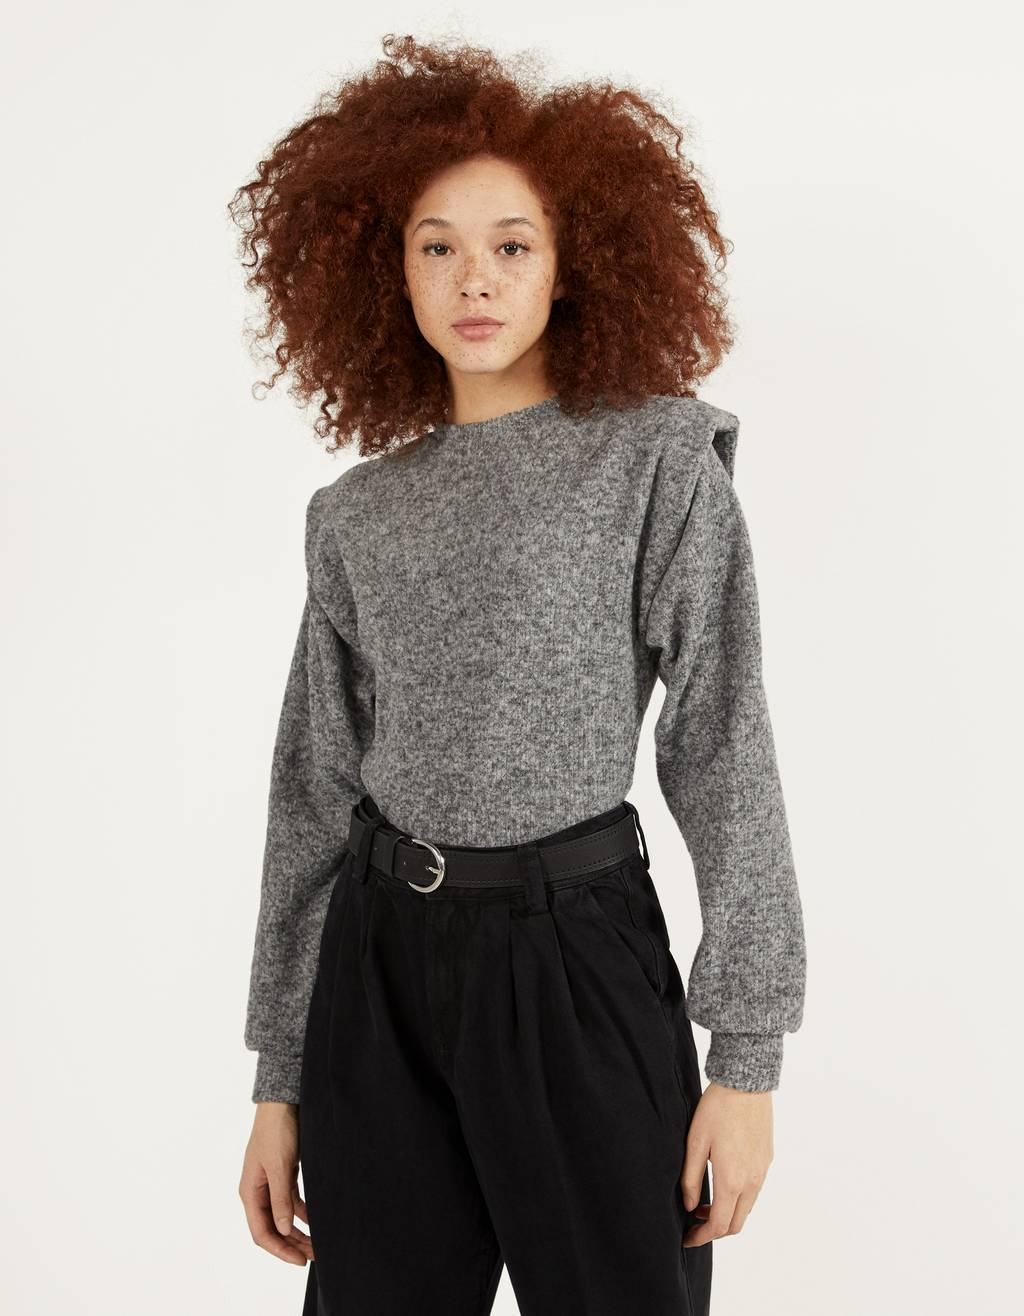 Sweatshirt de gola alta